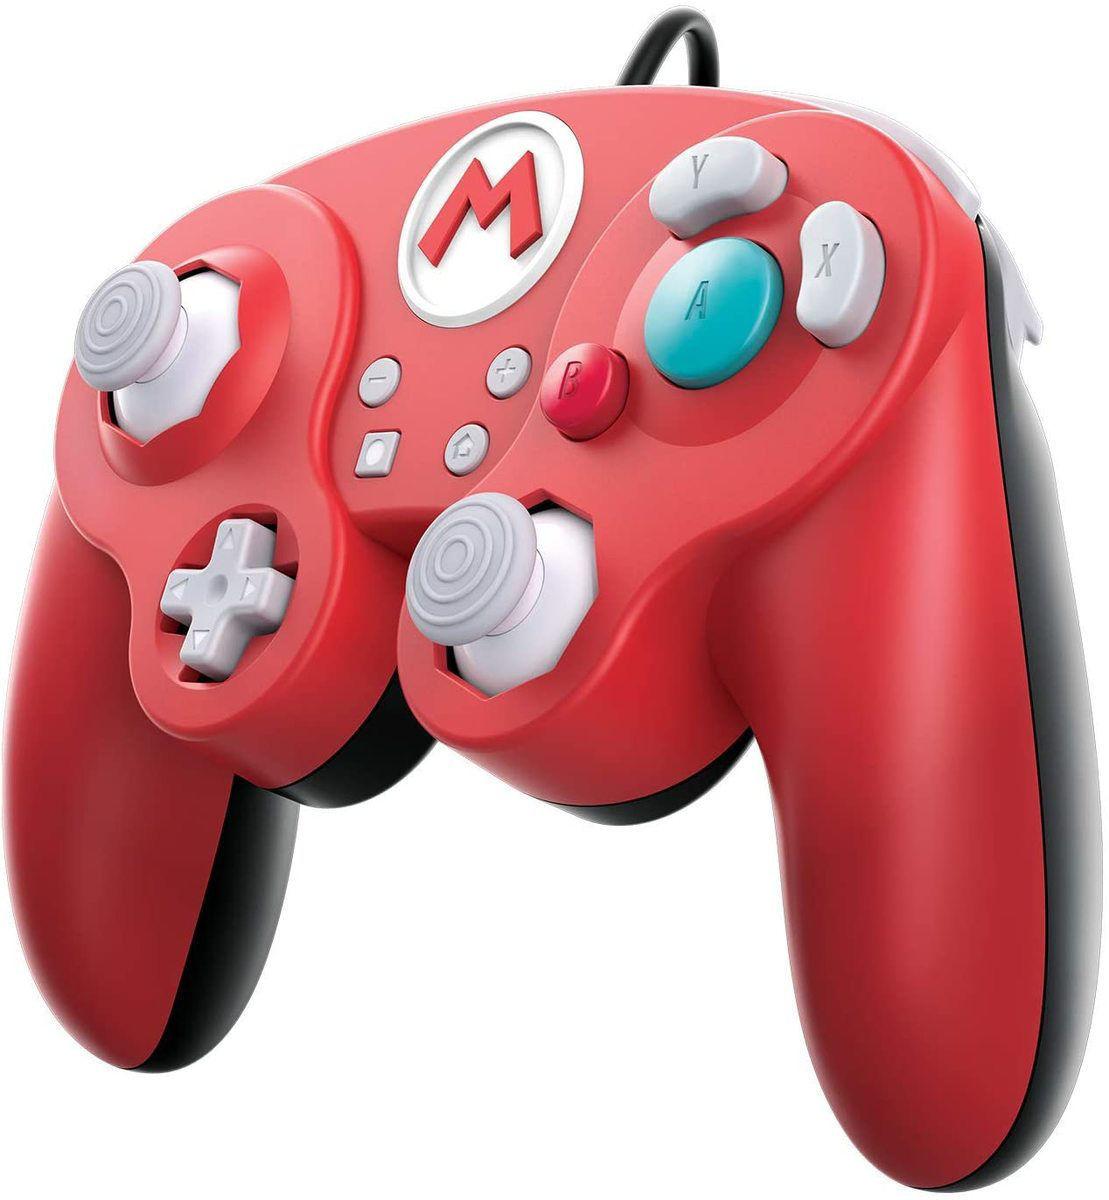 Super Smash Pro Wires Controller Red Super Mario GameCube in a retro design